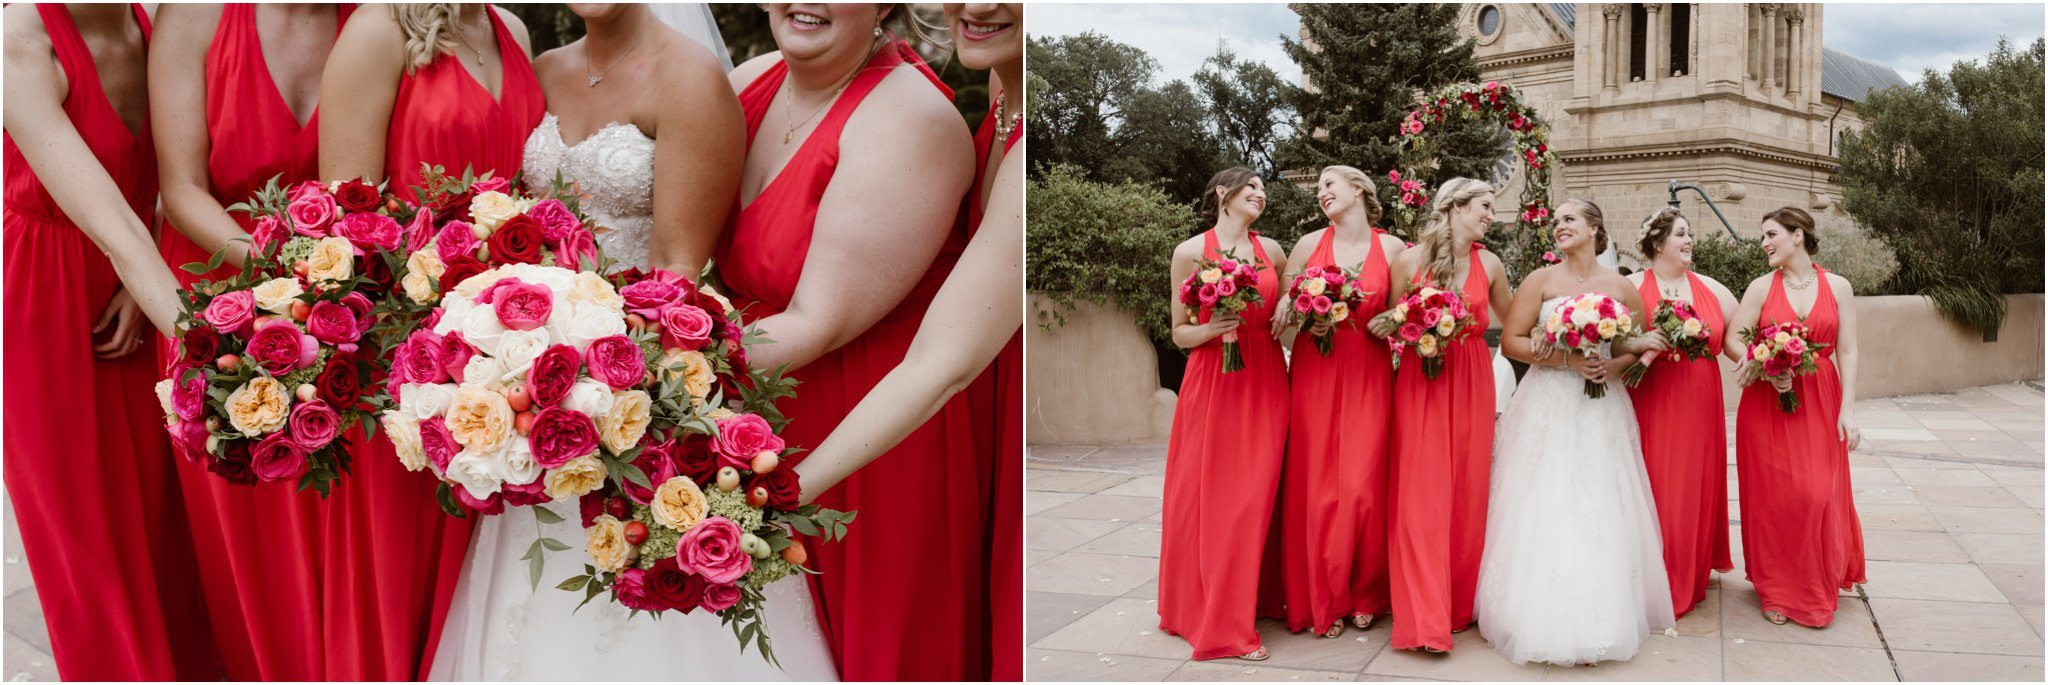 0053albuquerque-wedding-photographer_-santa-fe-wedding-photographer_-southwest-wedding-photography_-blue-rose-studio